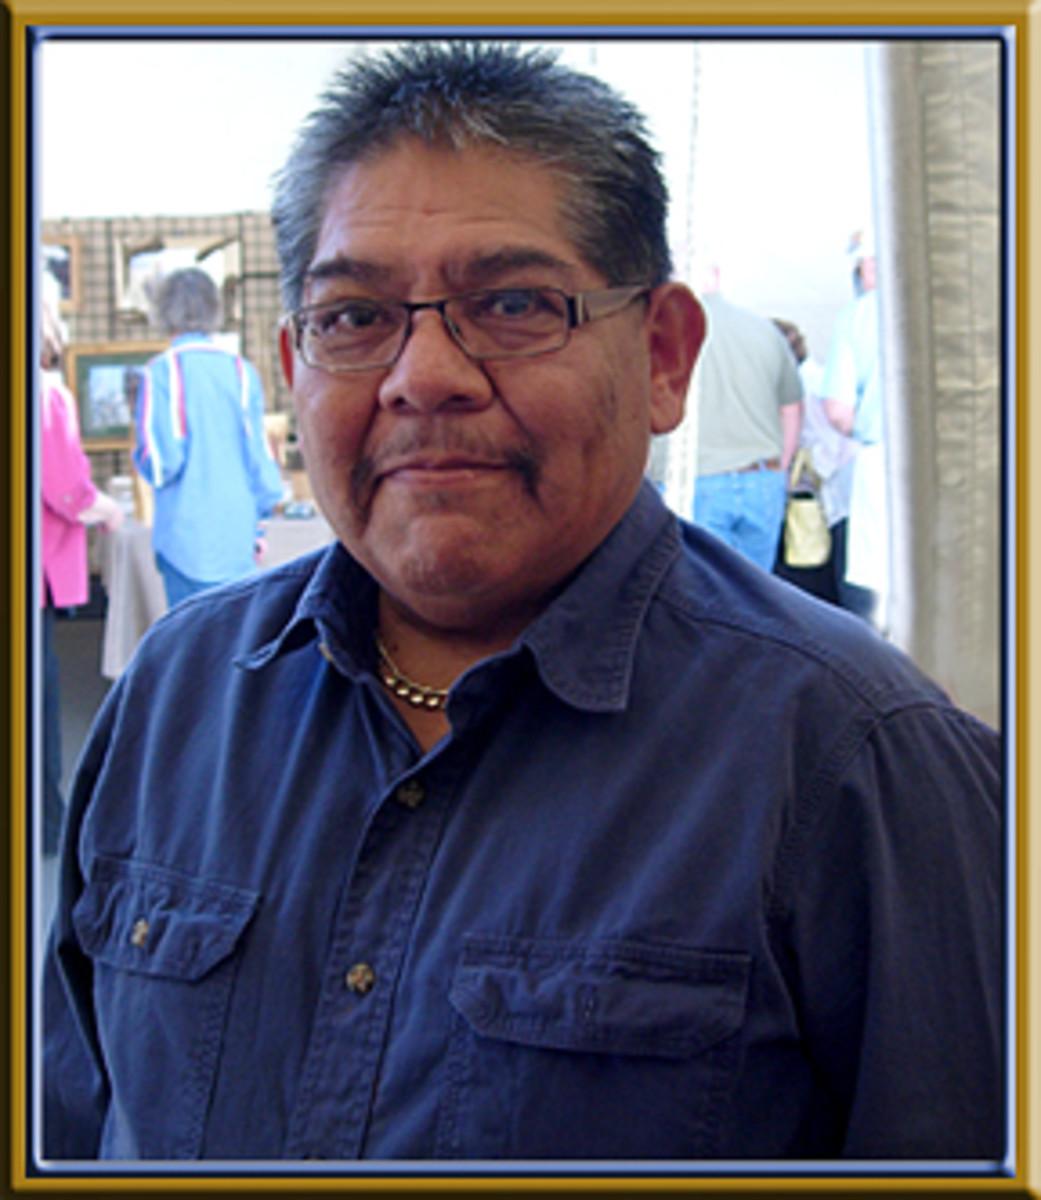 Hopi silver jeweler Watson Honanie